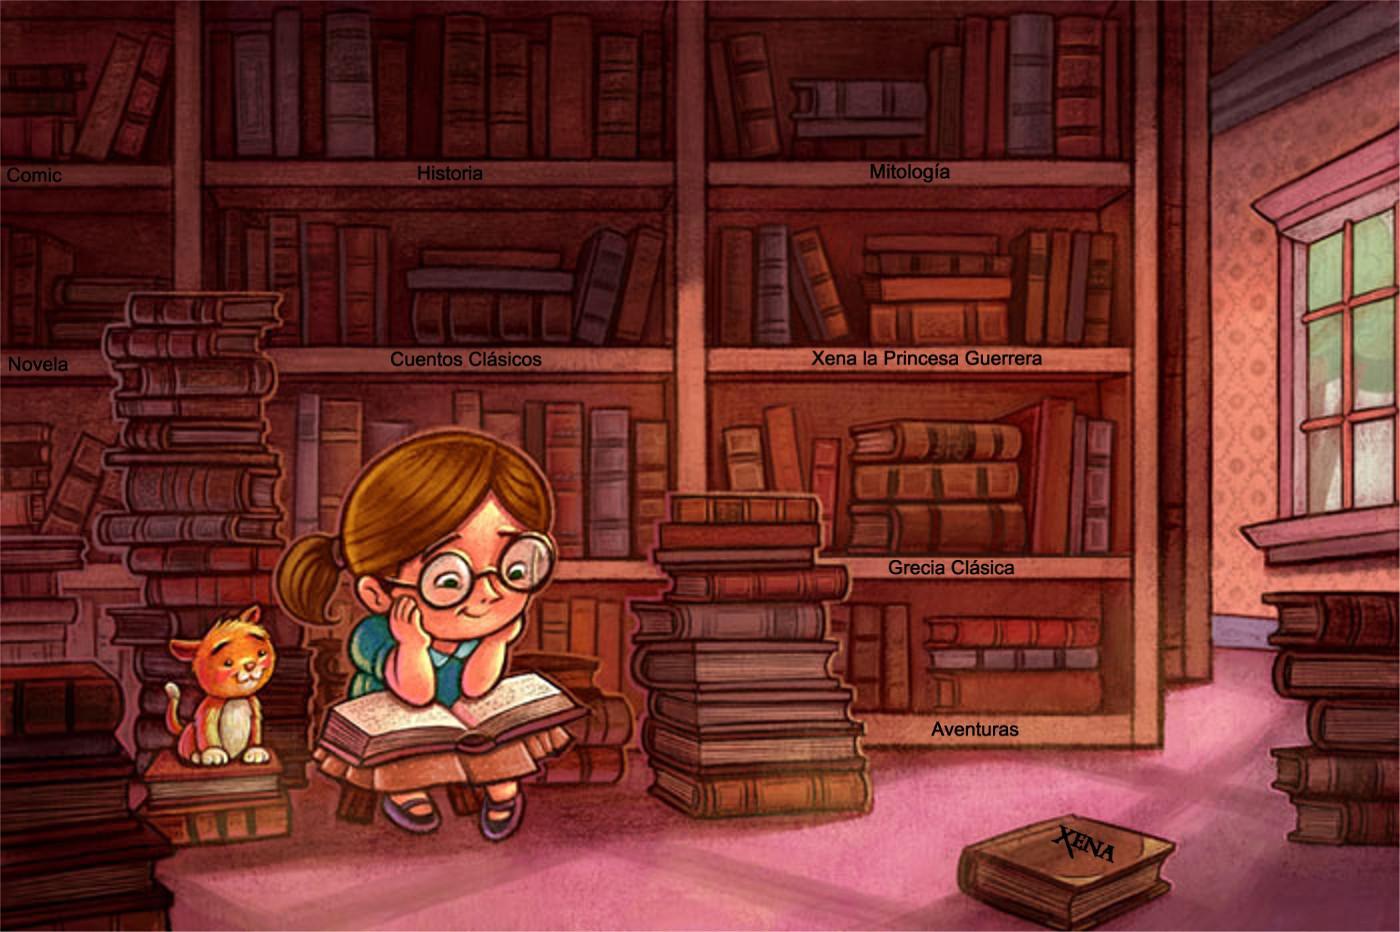 Los deseos vuelven a cumplirse en pozuelo en pozuelo - Libreria pozuelo ...